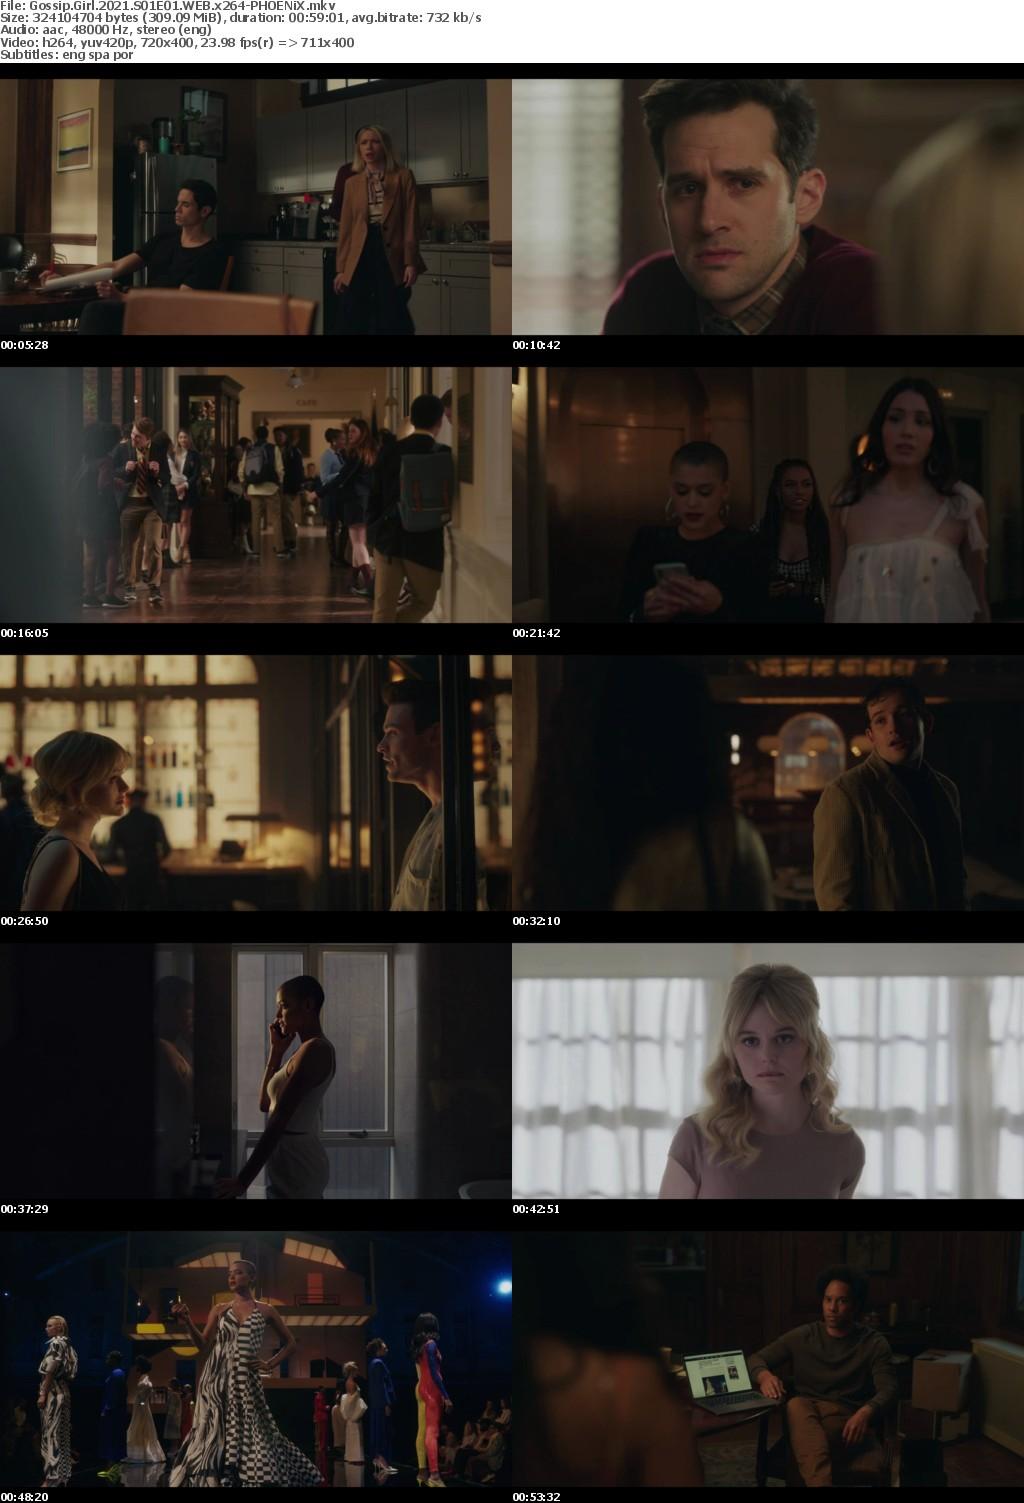 Gossip Girl 2021 S01E01 WEB x264-PHOENiX